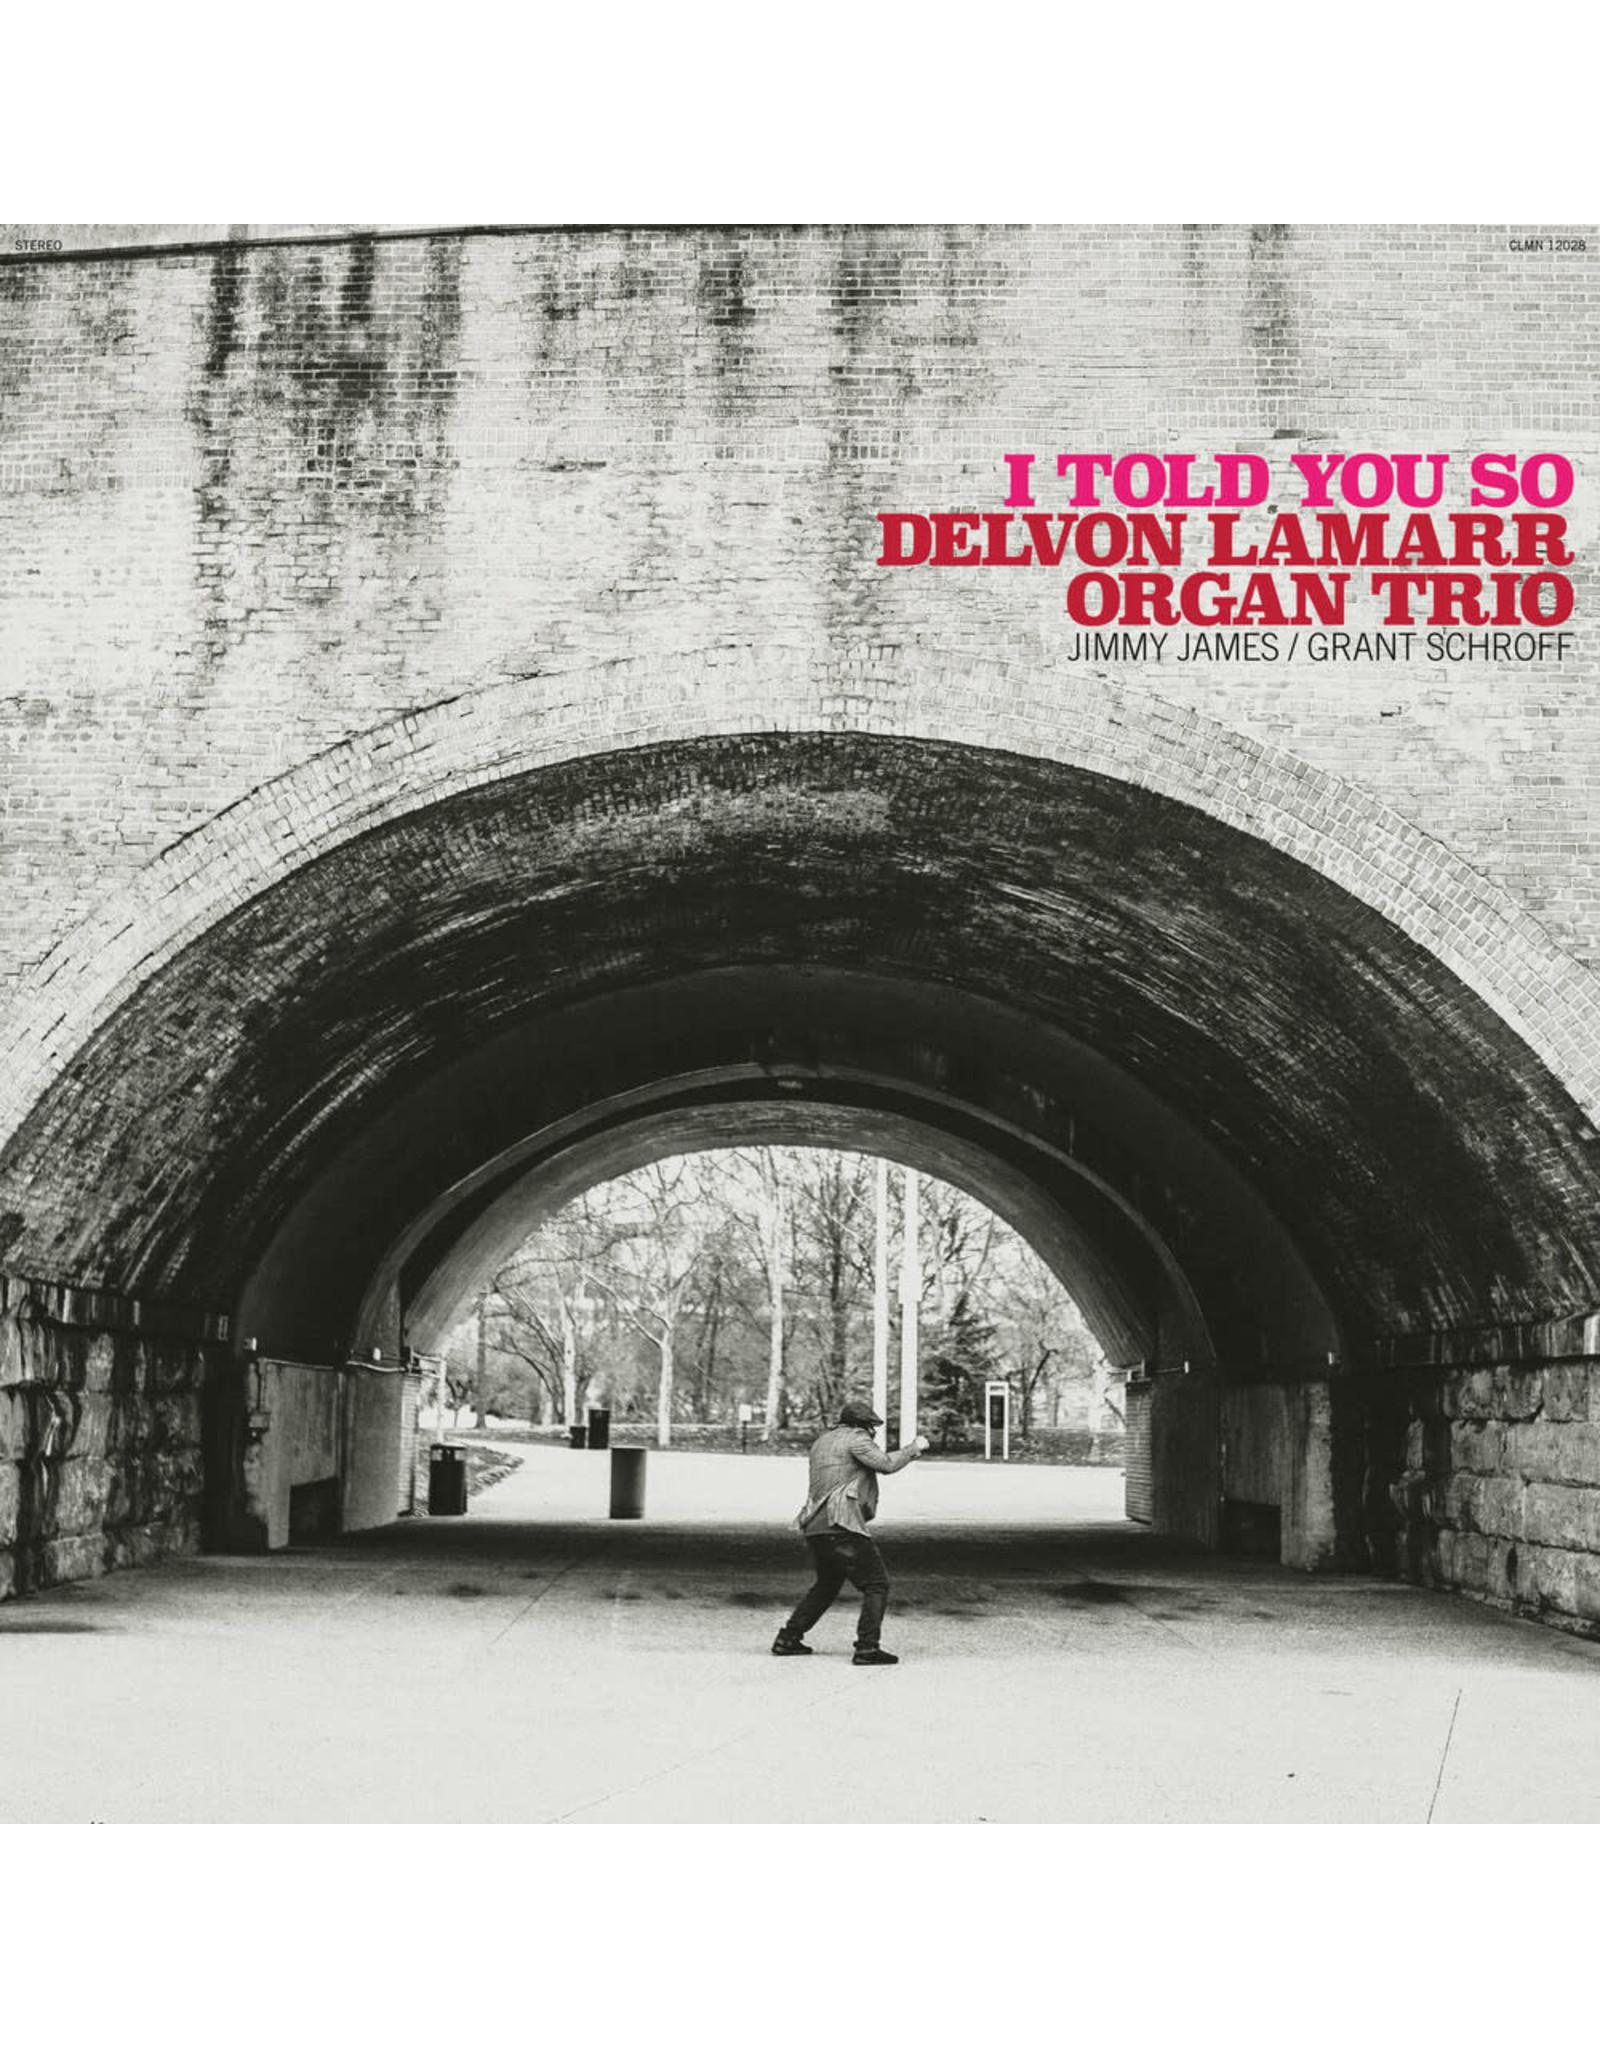 Delvon Lamarr Organ Trio - I Told You So